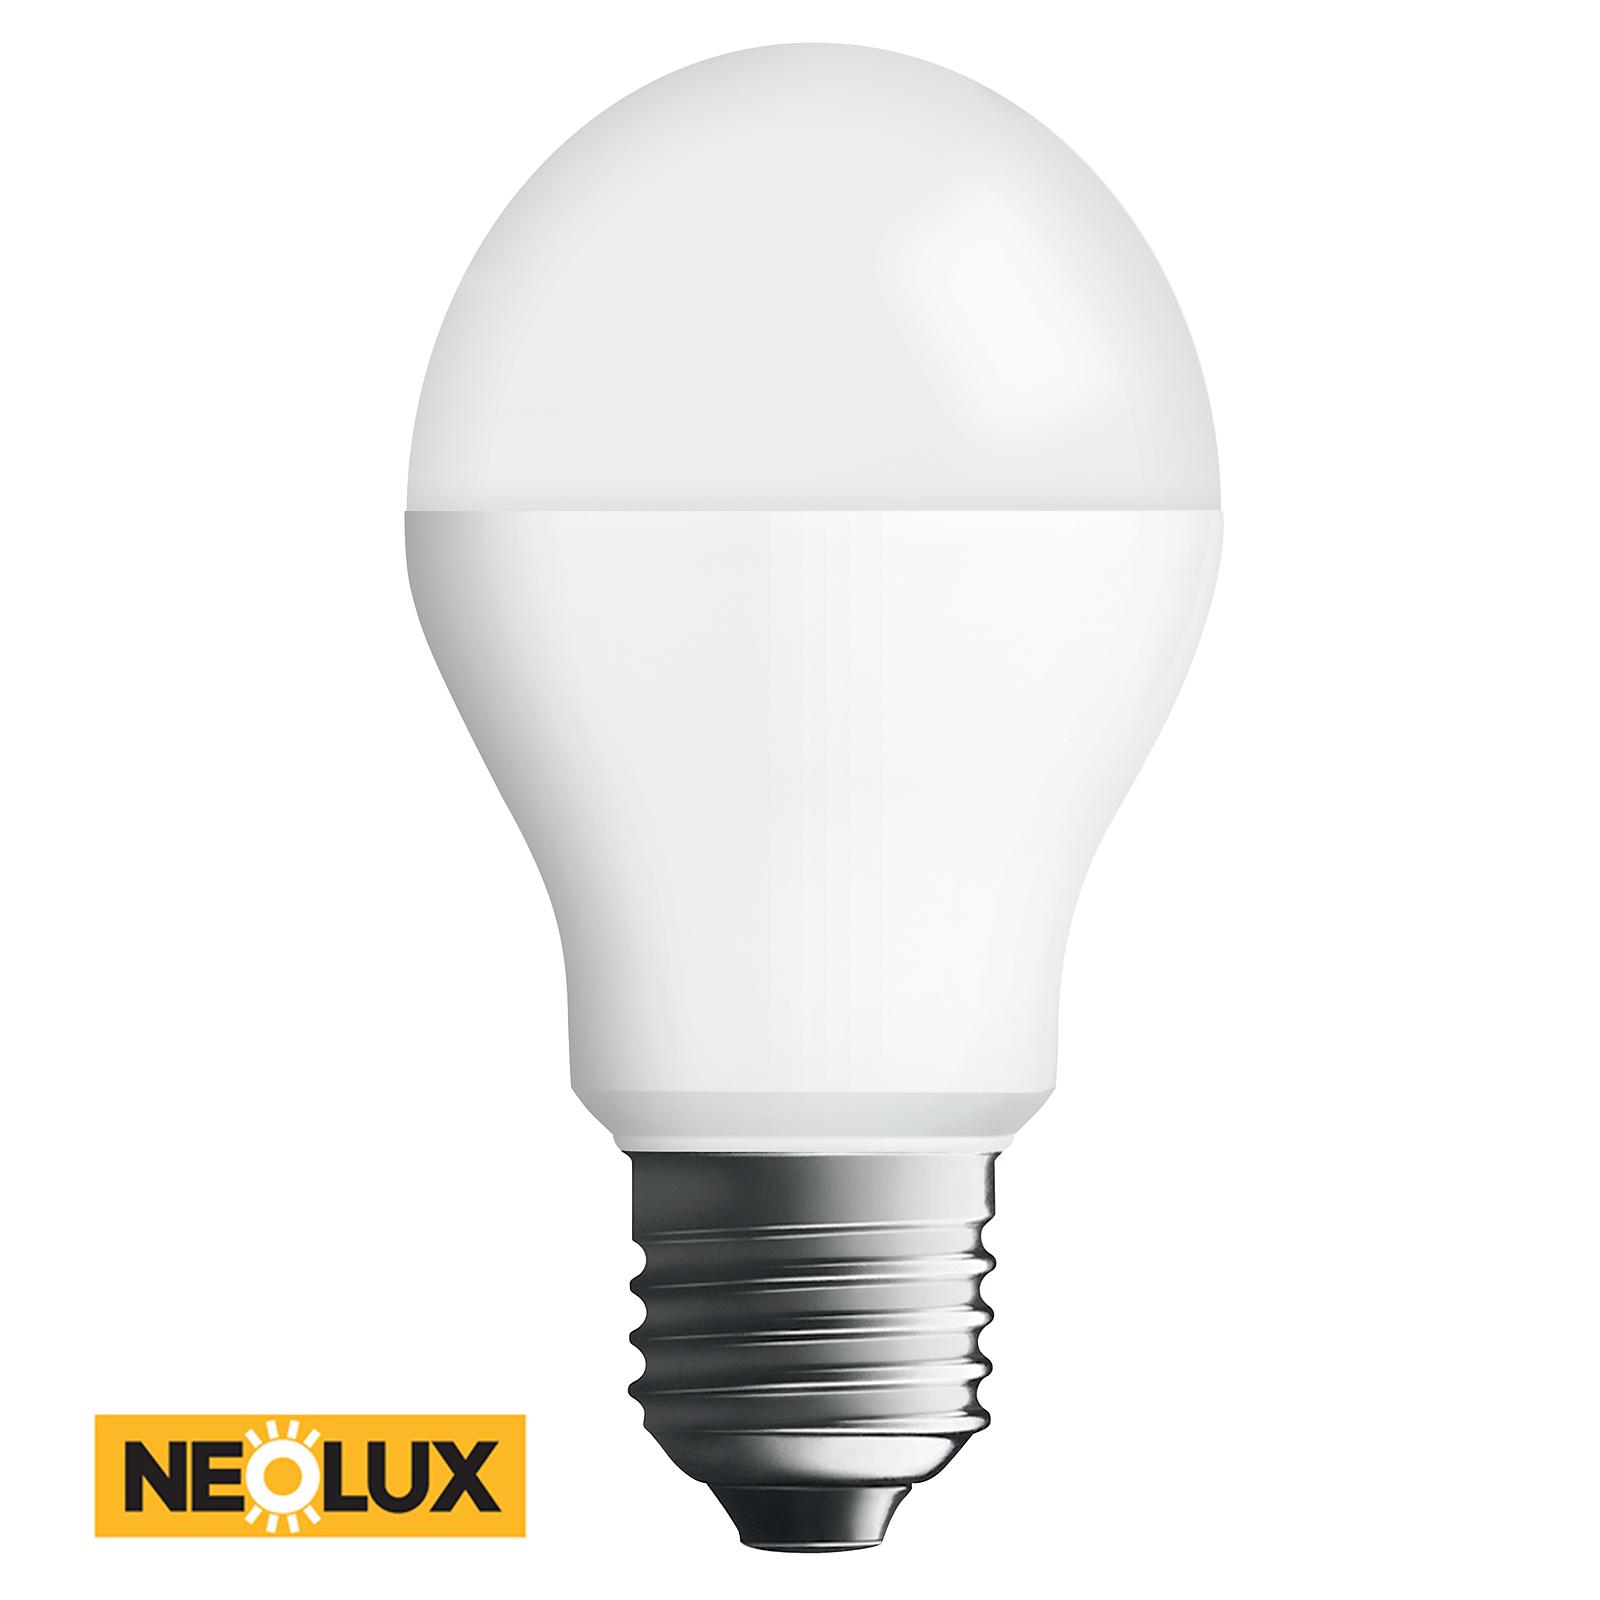 neolux led lampe e27 5 5w ersatz f r 40 watt 470 lumen. Black Bedroom Furniture Sets. Home Design Ideas